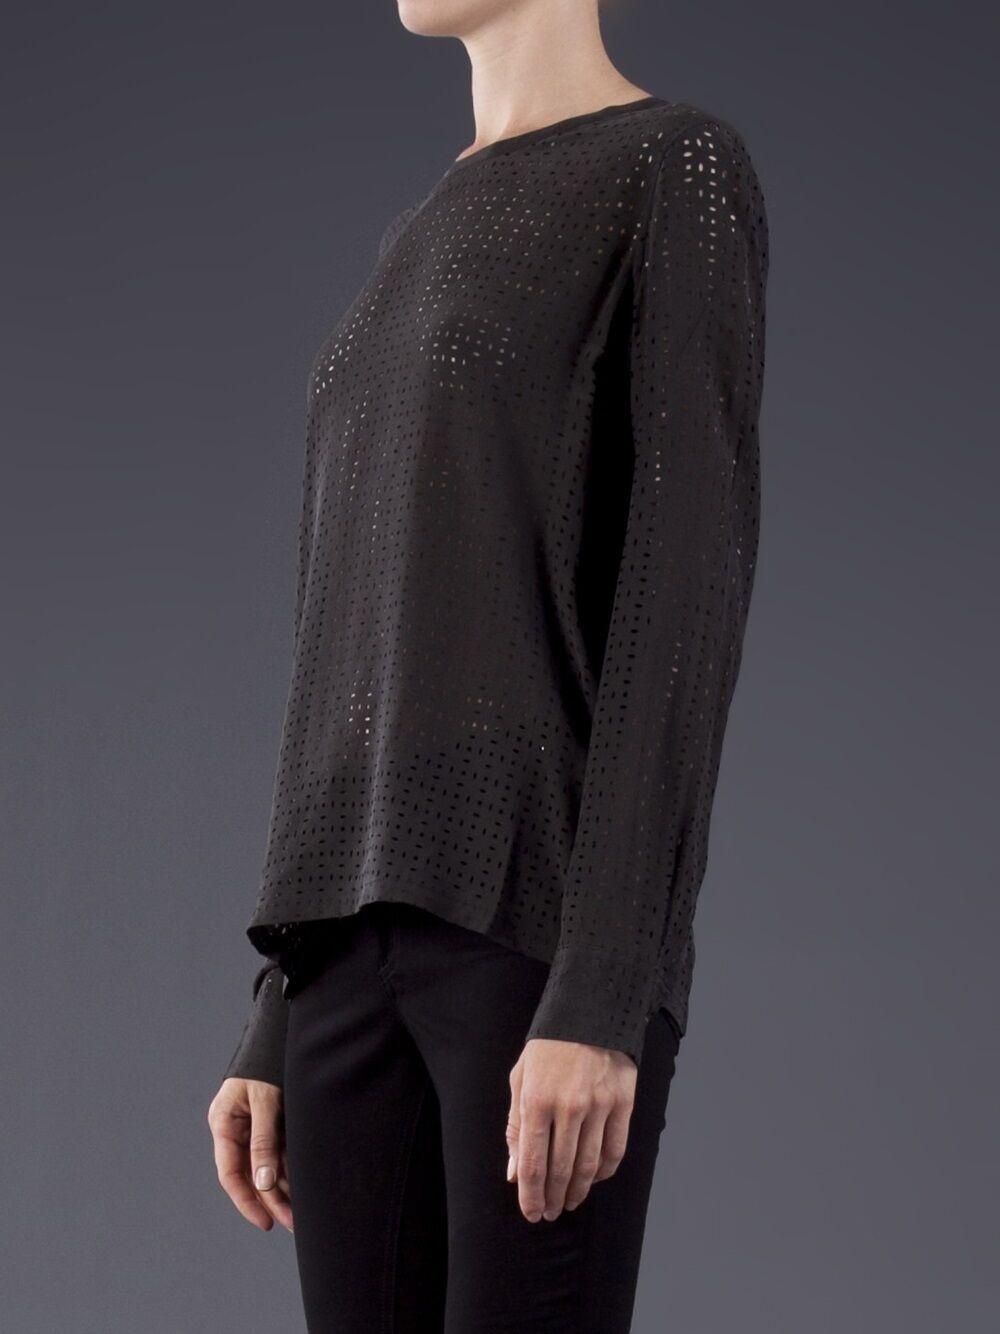 New  EQUIPMENT Liam Laser Cut Tee Top XS Silk perforated schwarz dress blouse